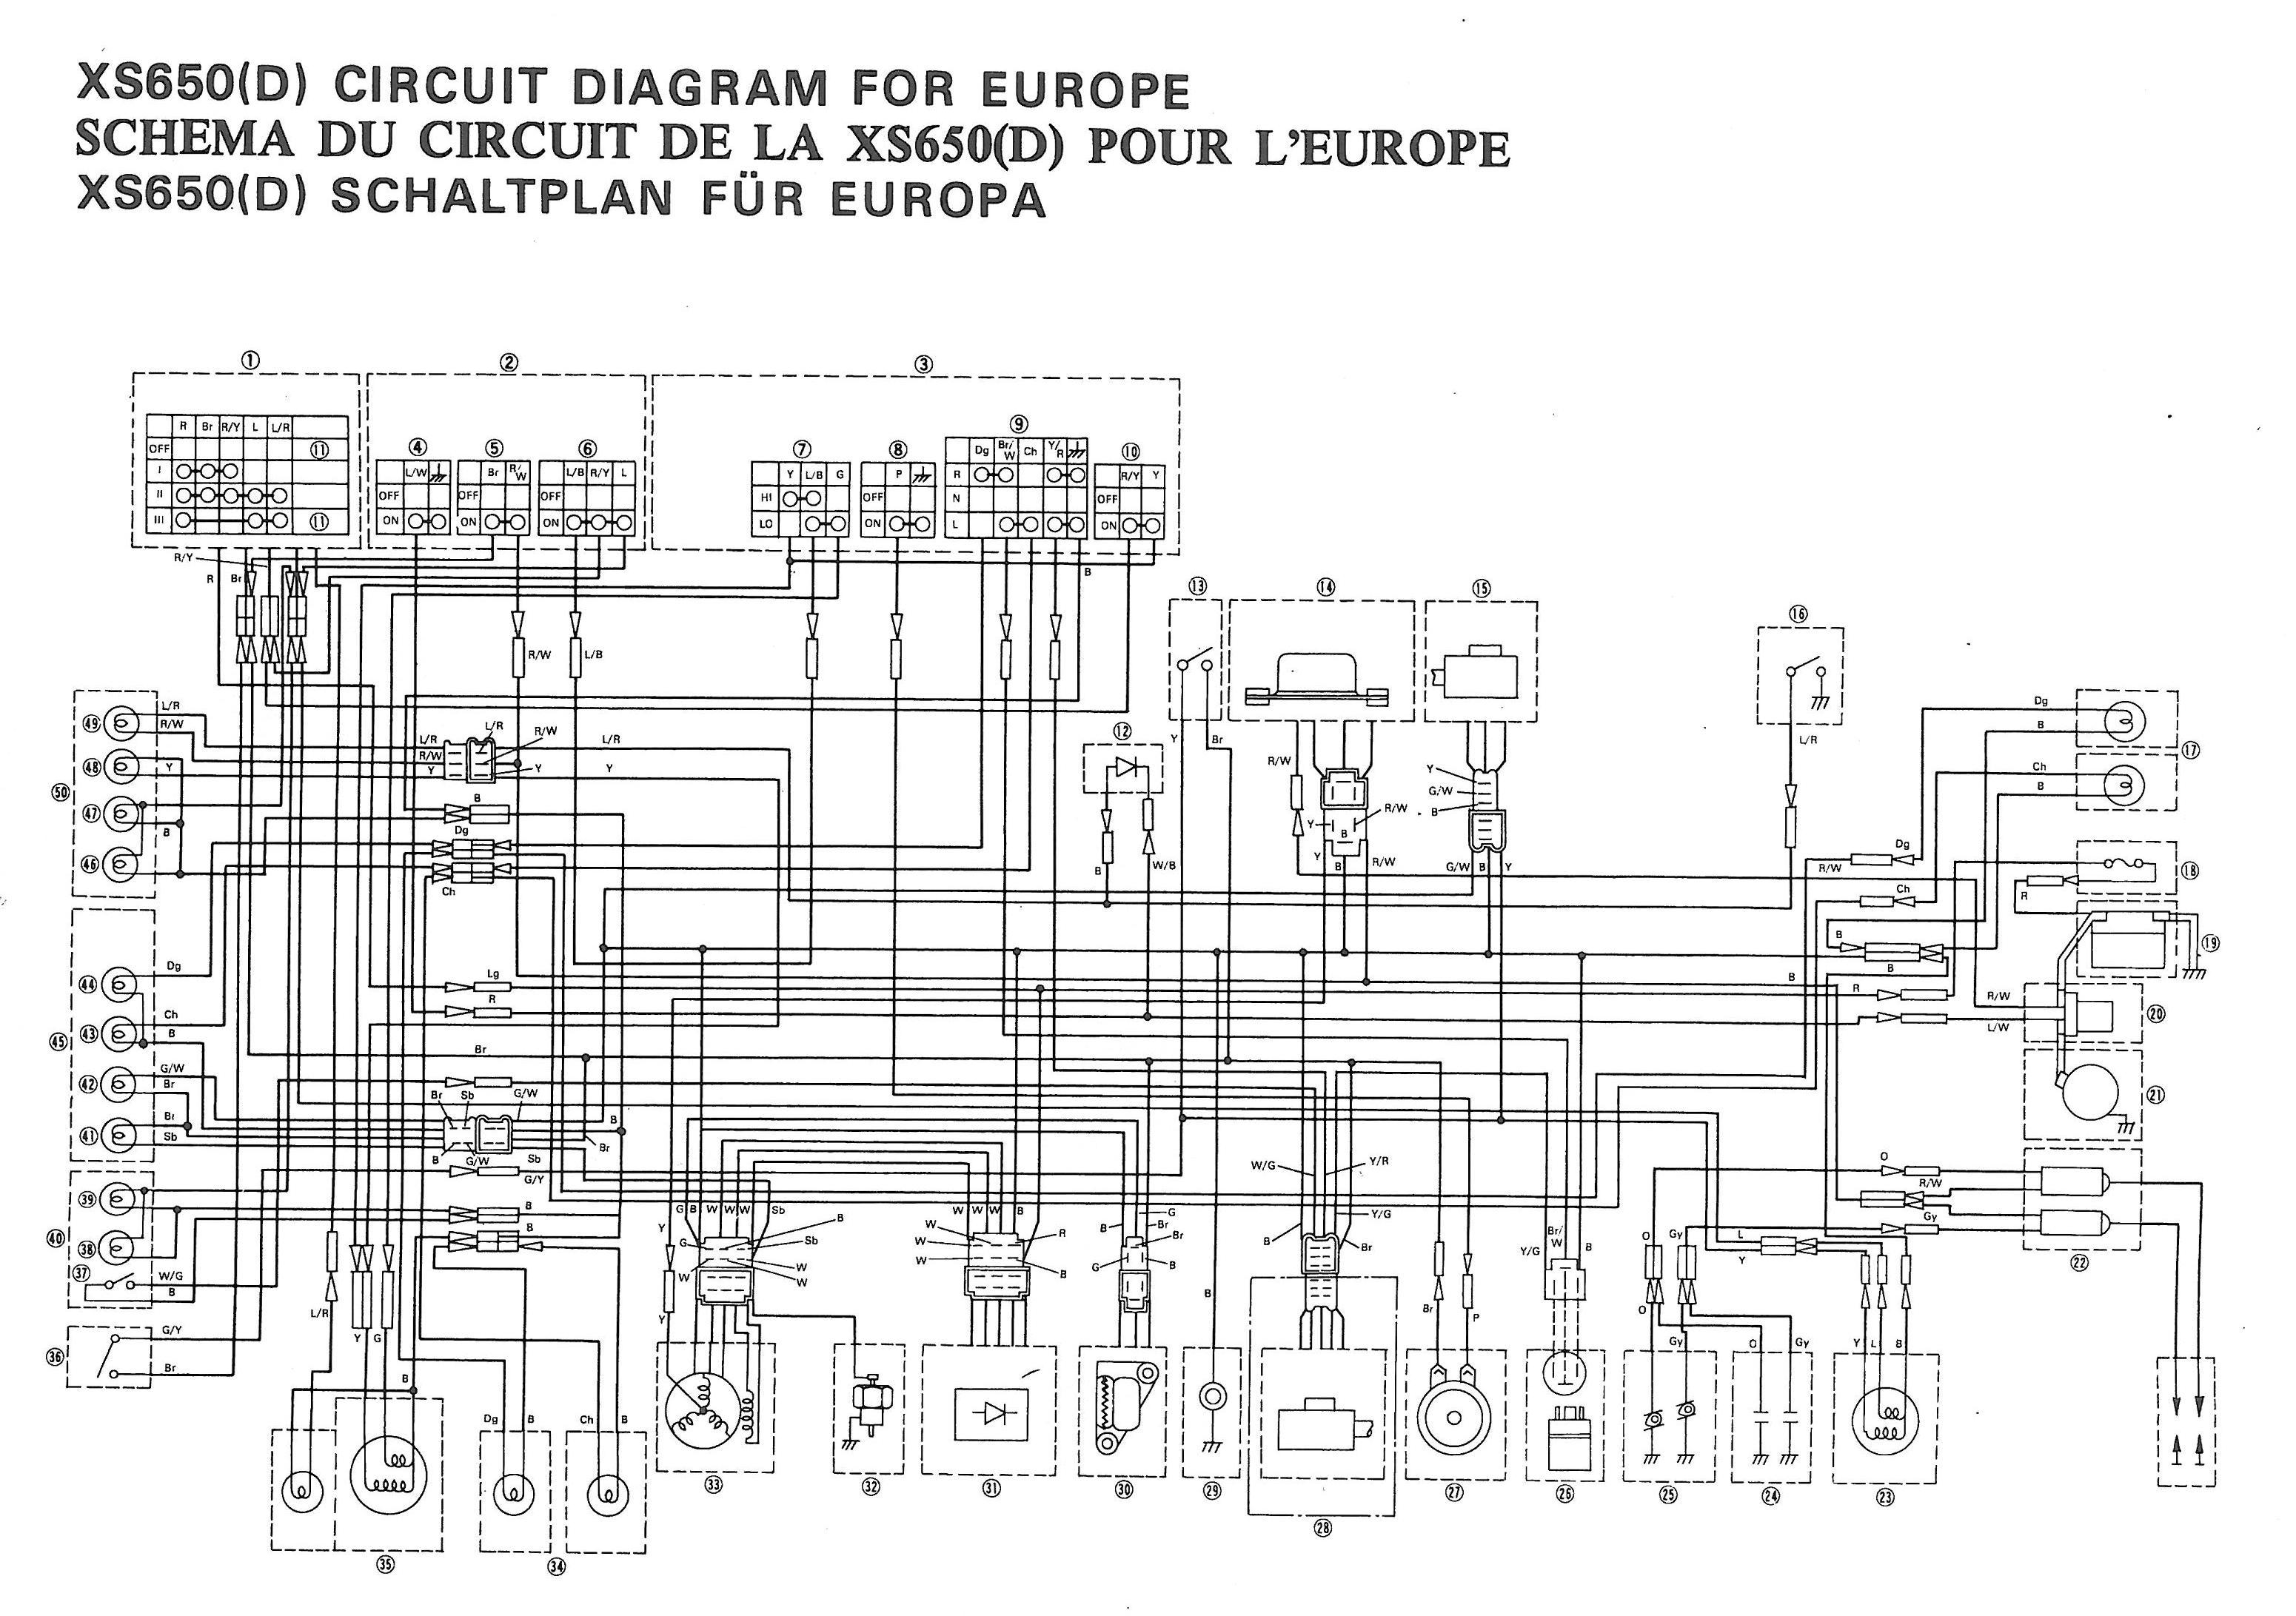 Fz700 Wiring Diagram - Wiring Diagram Liry on